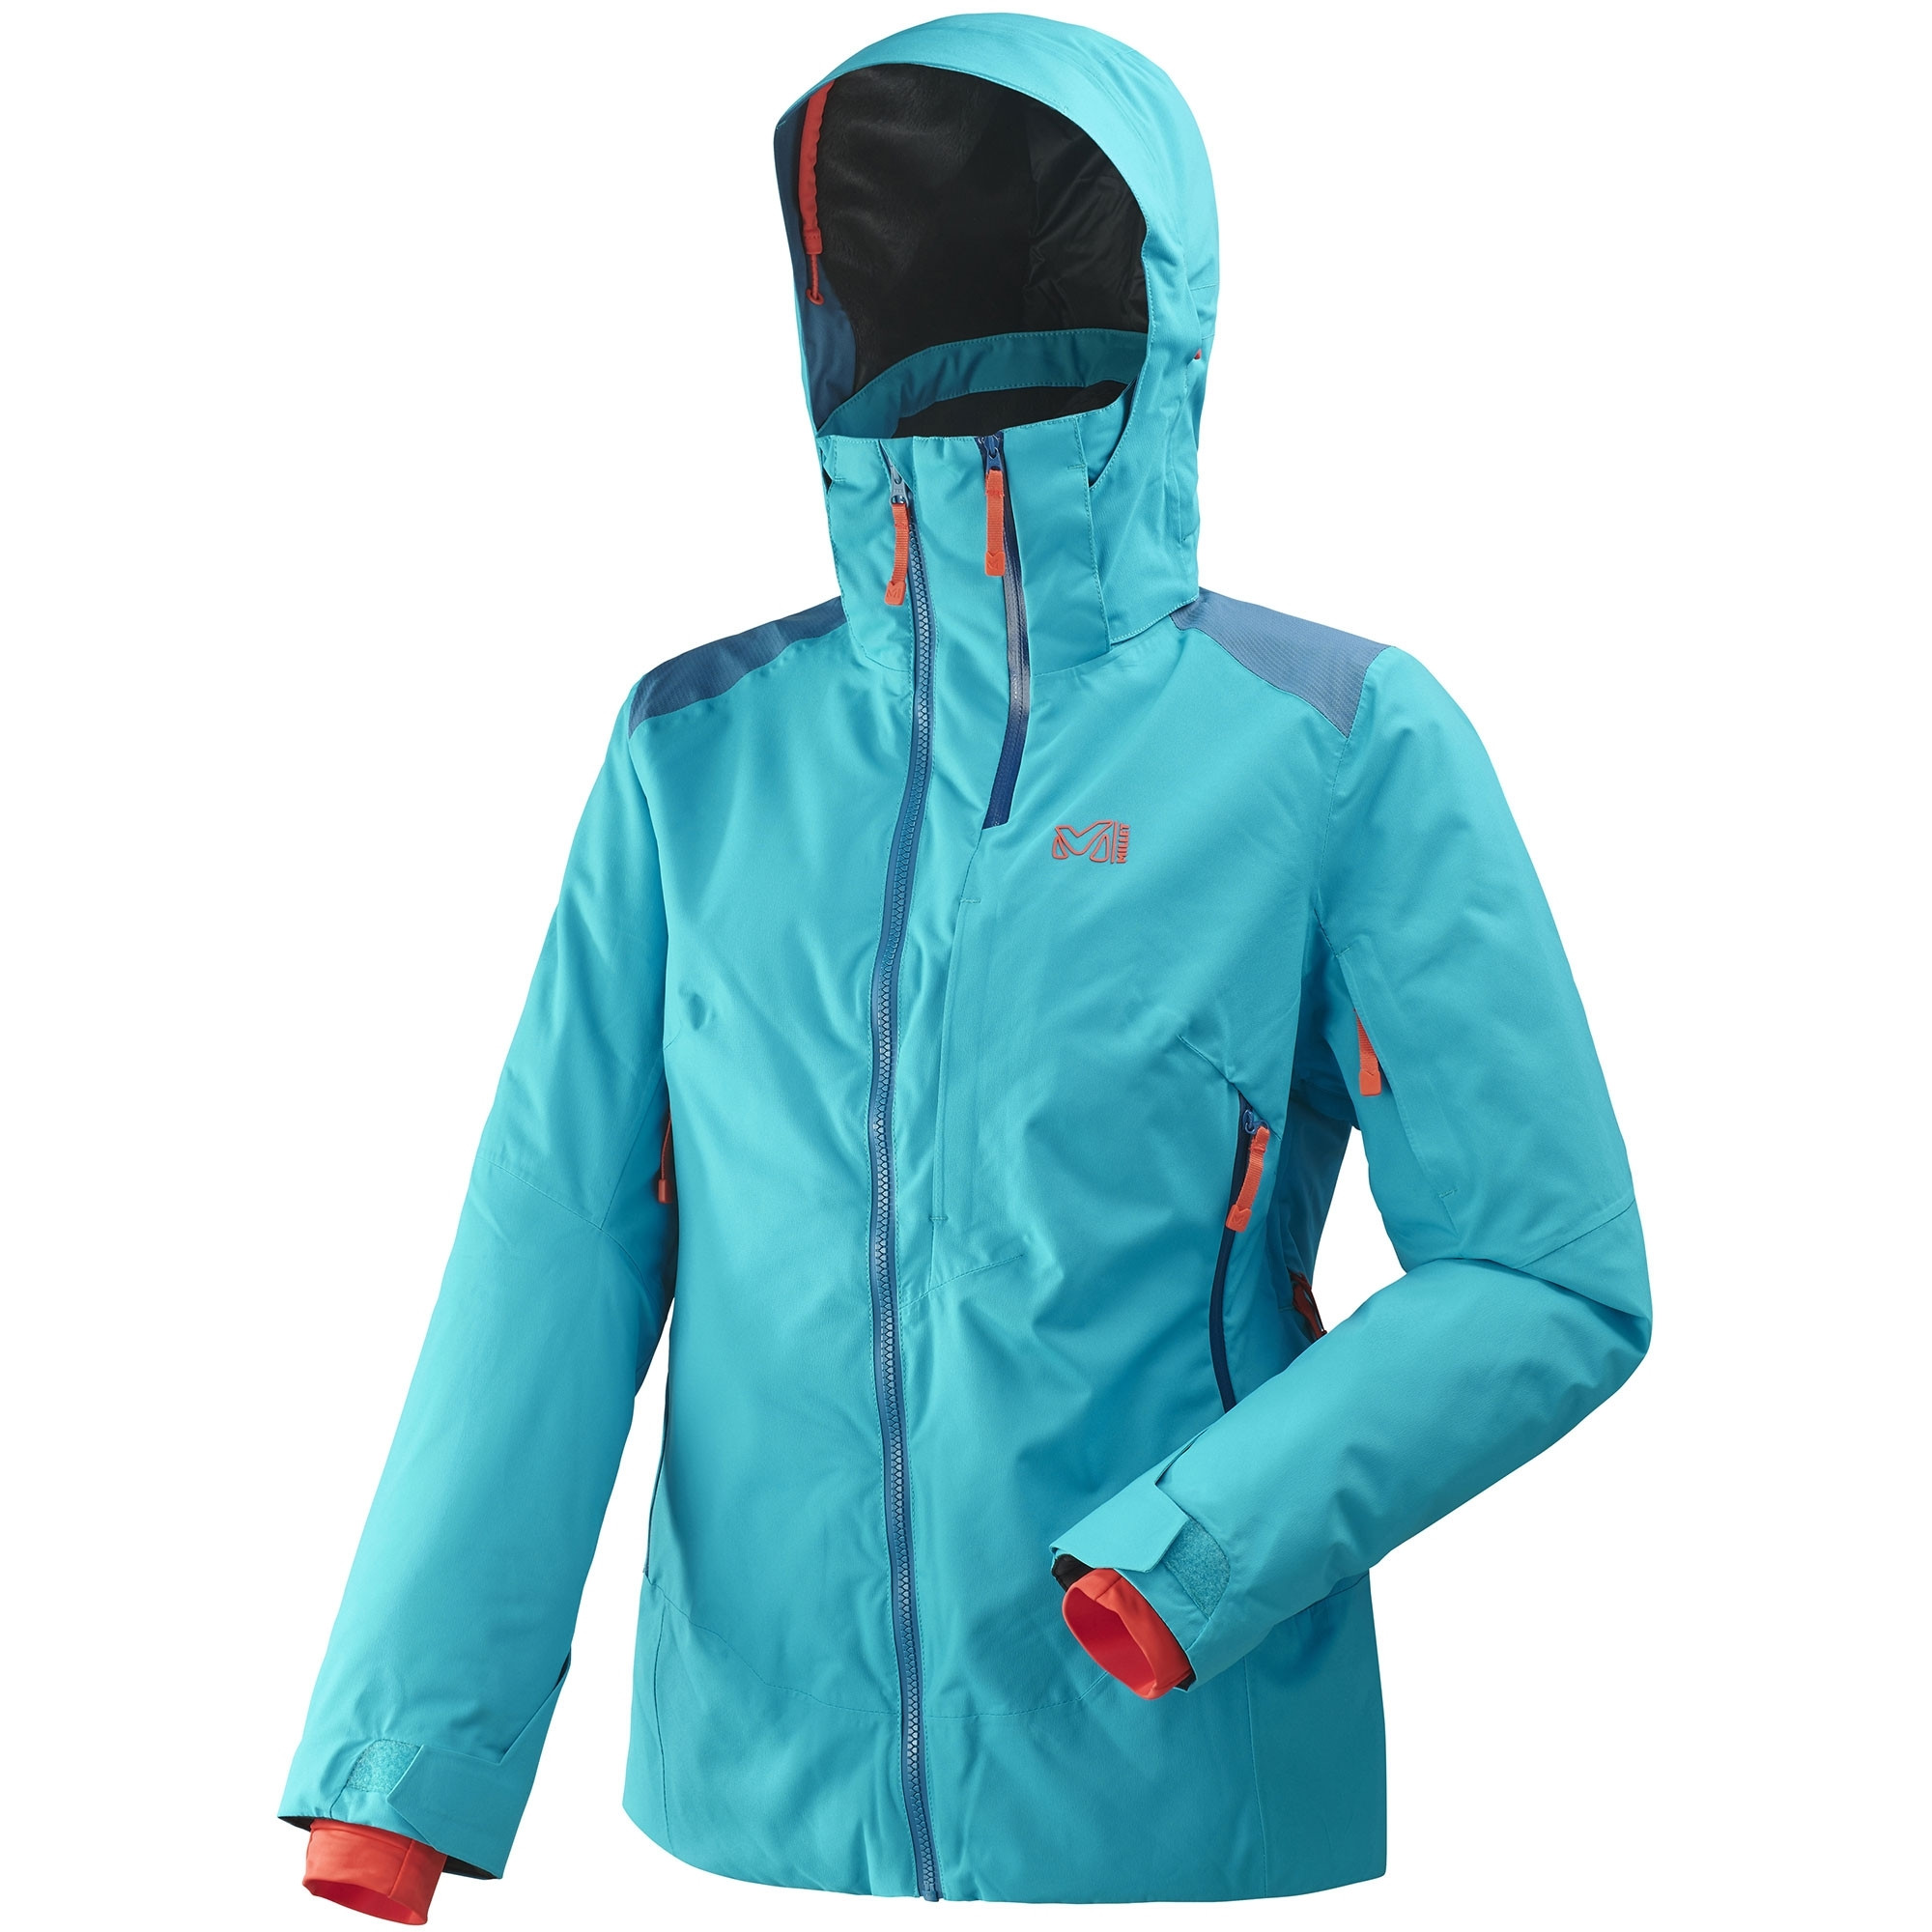 Stretch Femme De Veste Bleu Millet Ski 724 8ONnkP0Xw